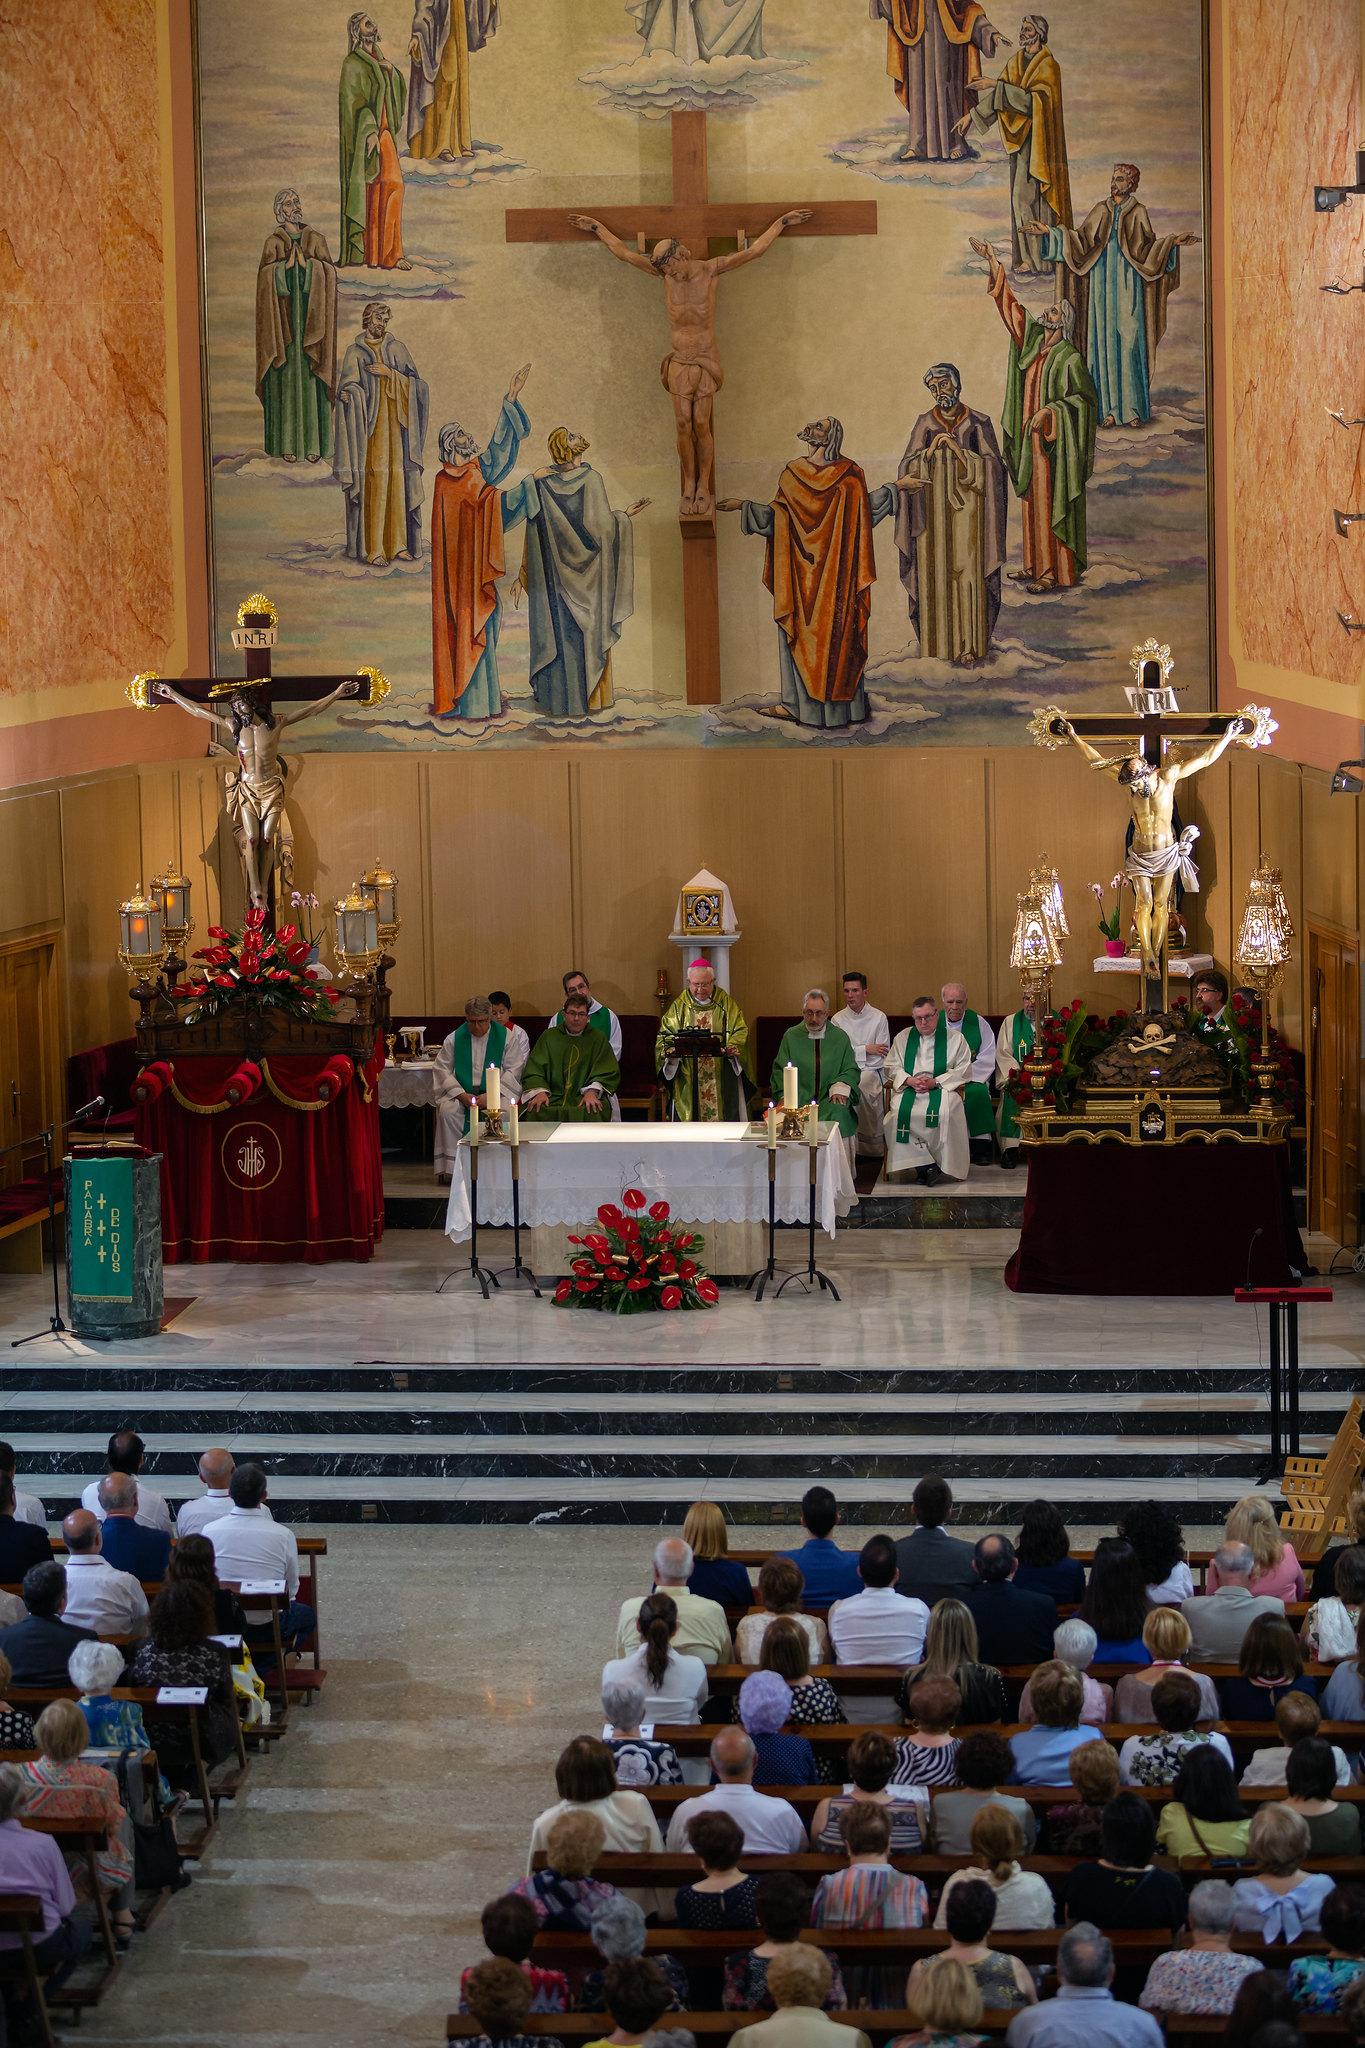 (2018-06-17) - 75 Aniversario - Encuentro - Vicent Olmos Navarro (08)